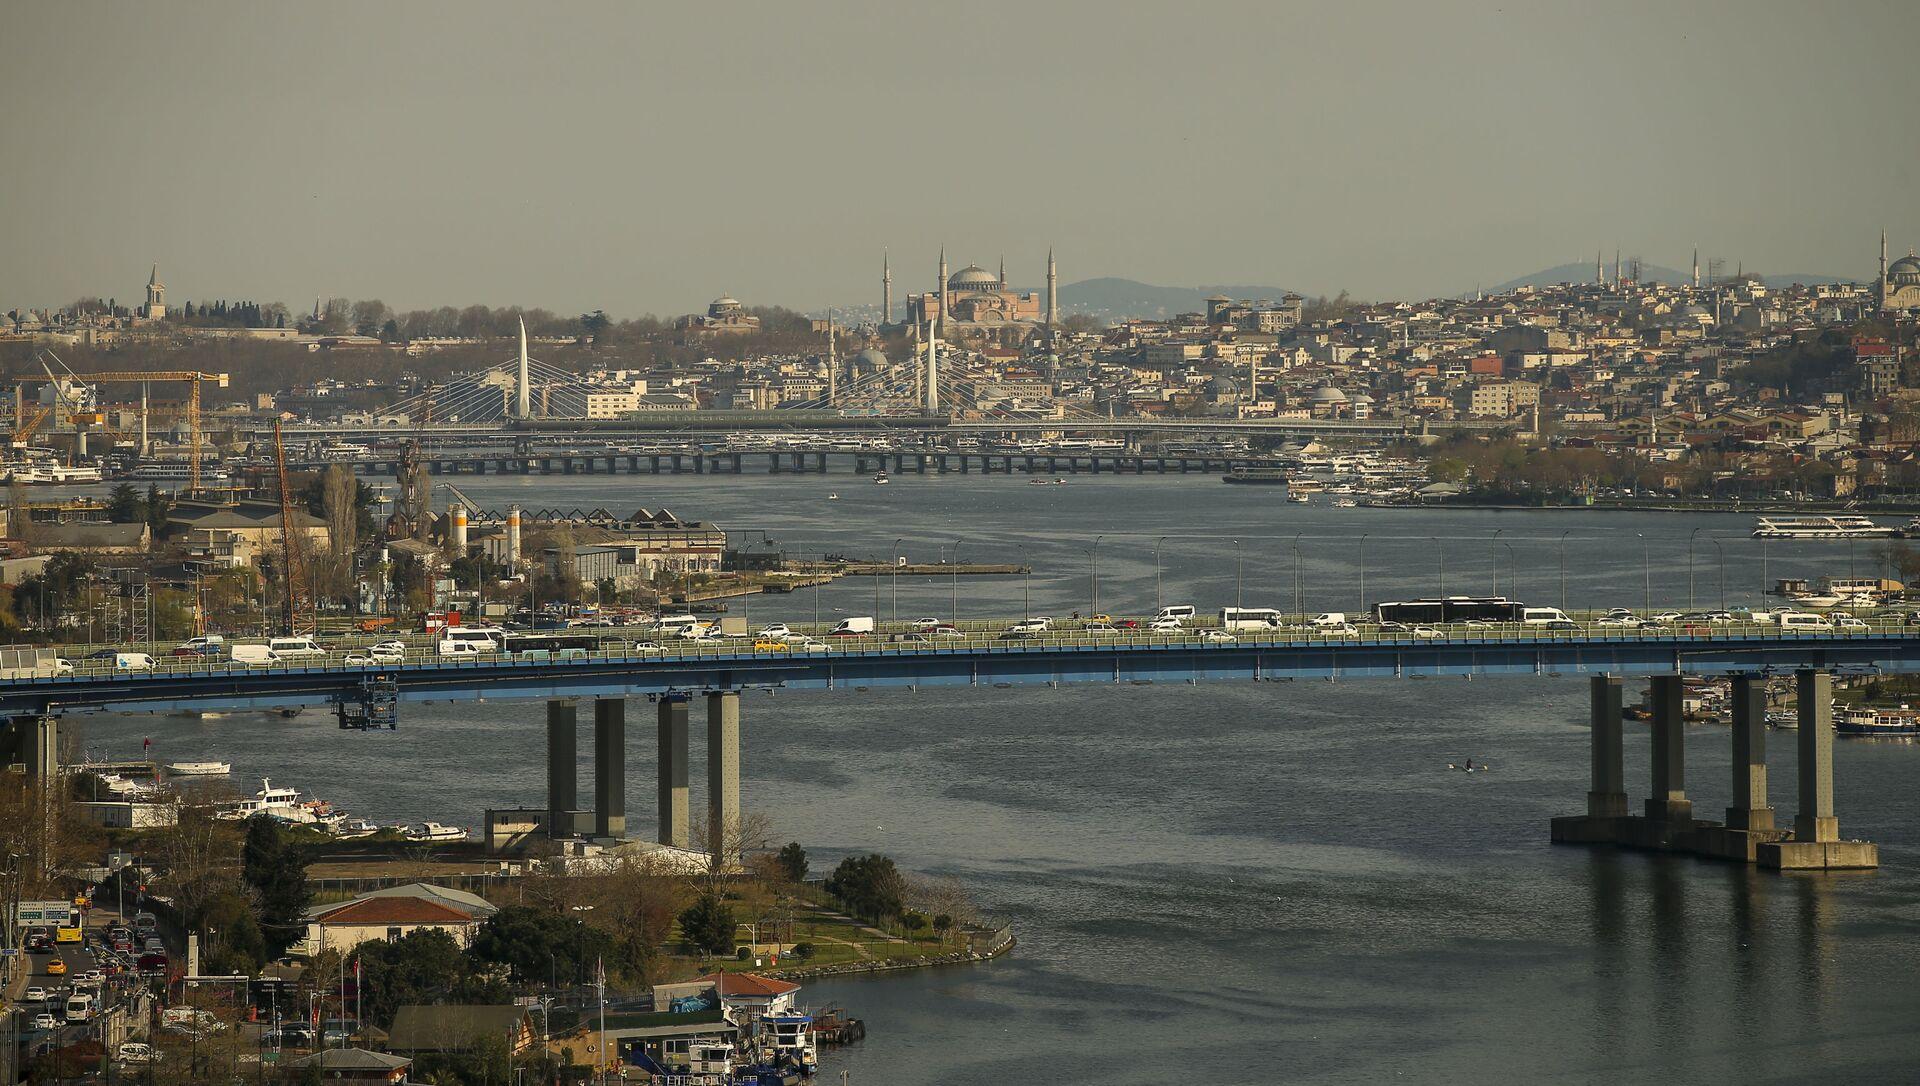 Вид на город Стамбул, фото из архива - Sputnik Azərbaycan, 1920, 18.09.2021